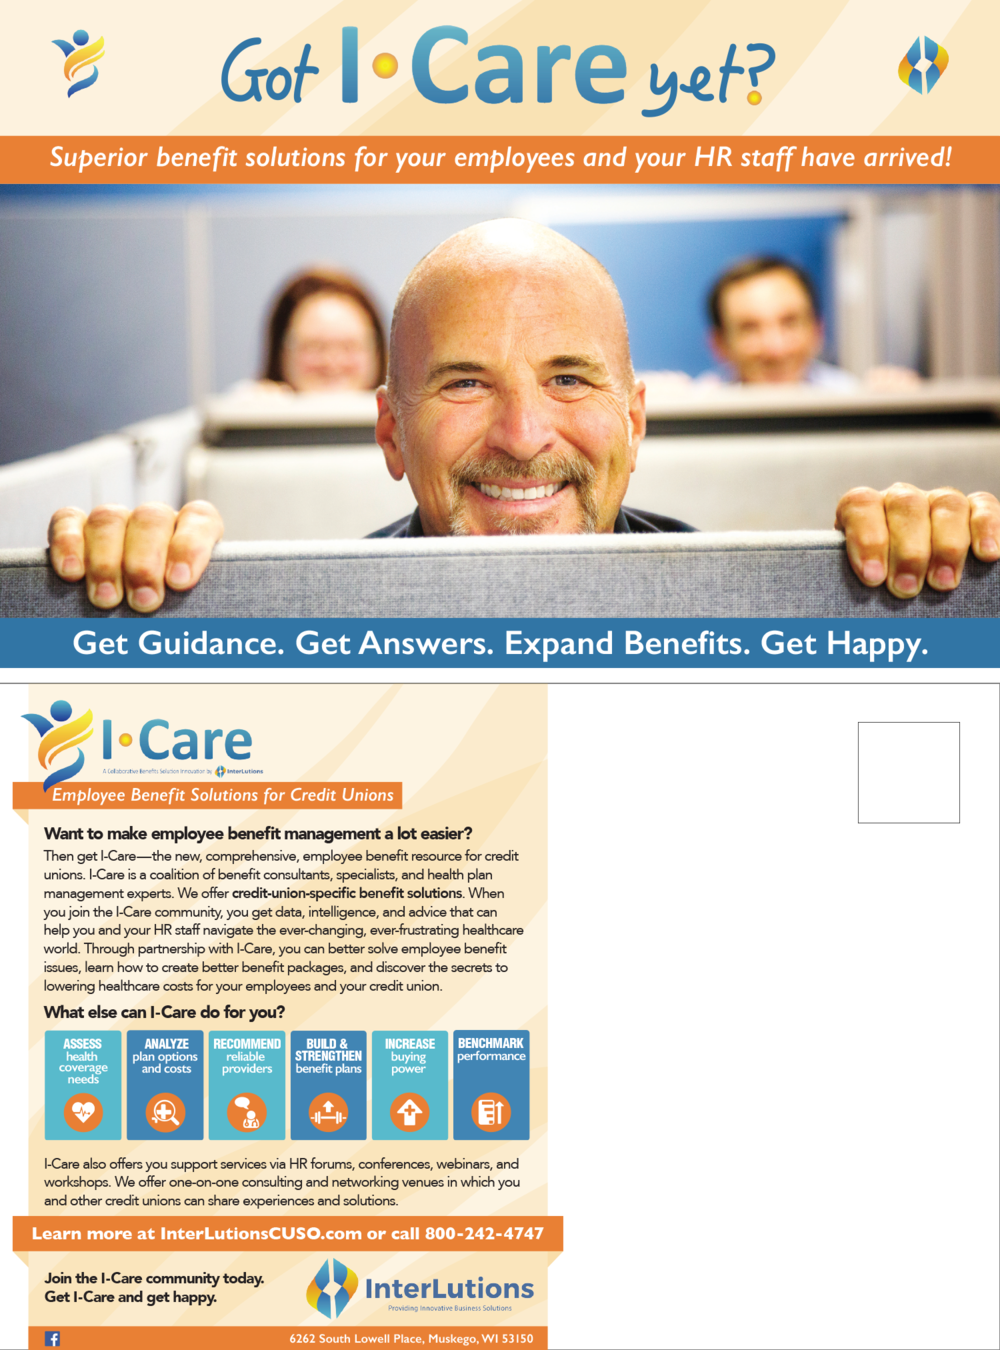 I-Care_Postcards_GotI_Care_051517.png